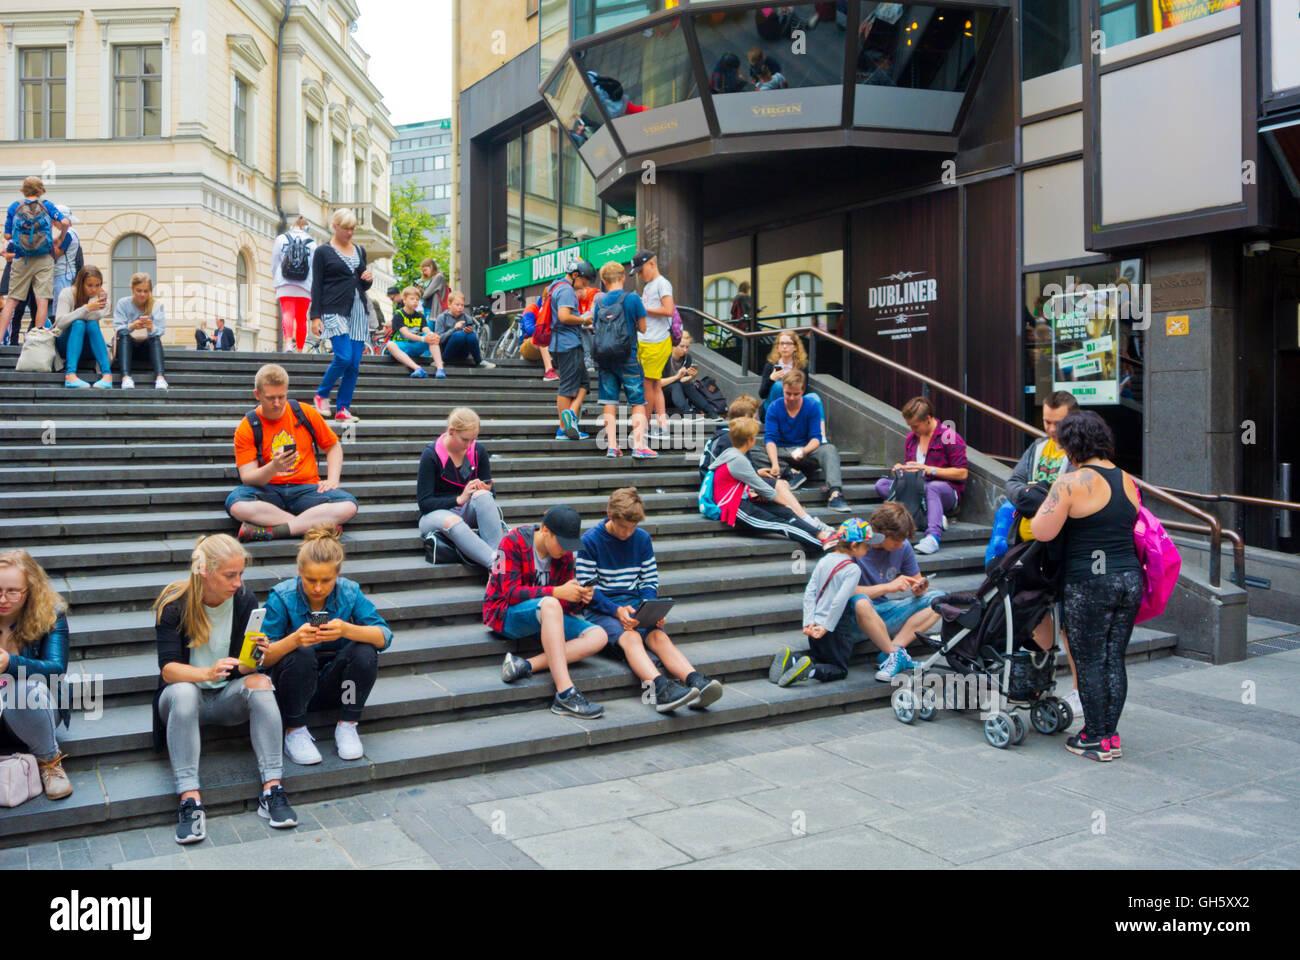 Pokemon Go, game stop, with pokemon shot, Kaivopiha, Helsinki, Finland - Stock Image